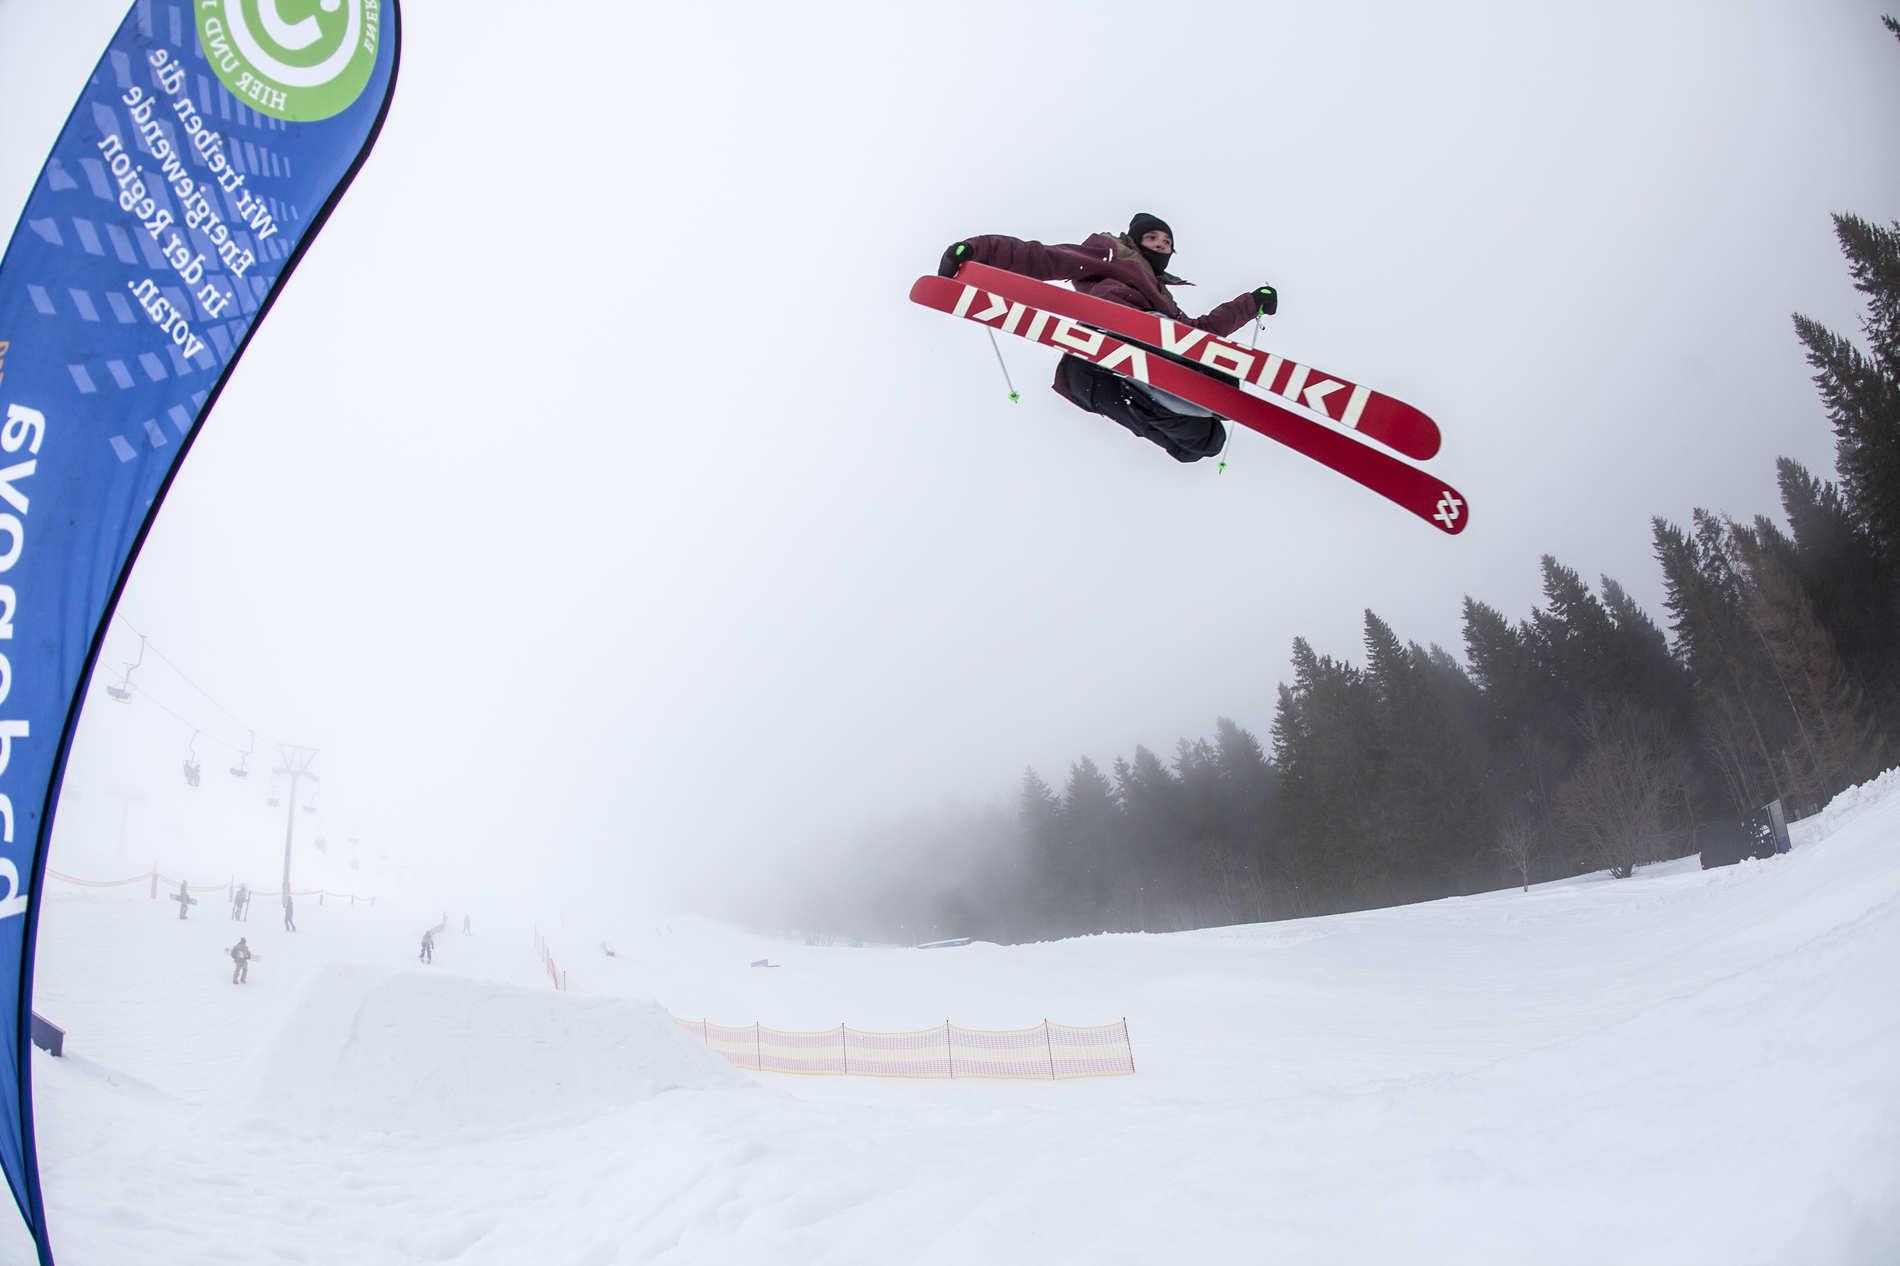 web snowpark feldberg 17 03 2018 action fs thomas martin herrmann qparks 2